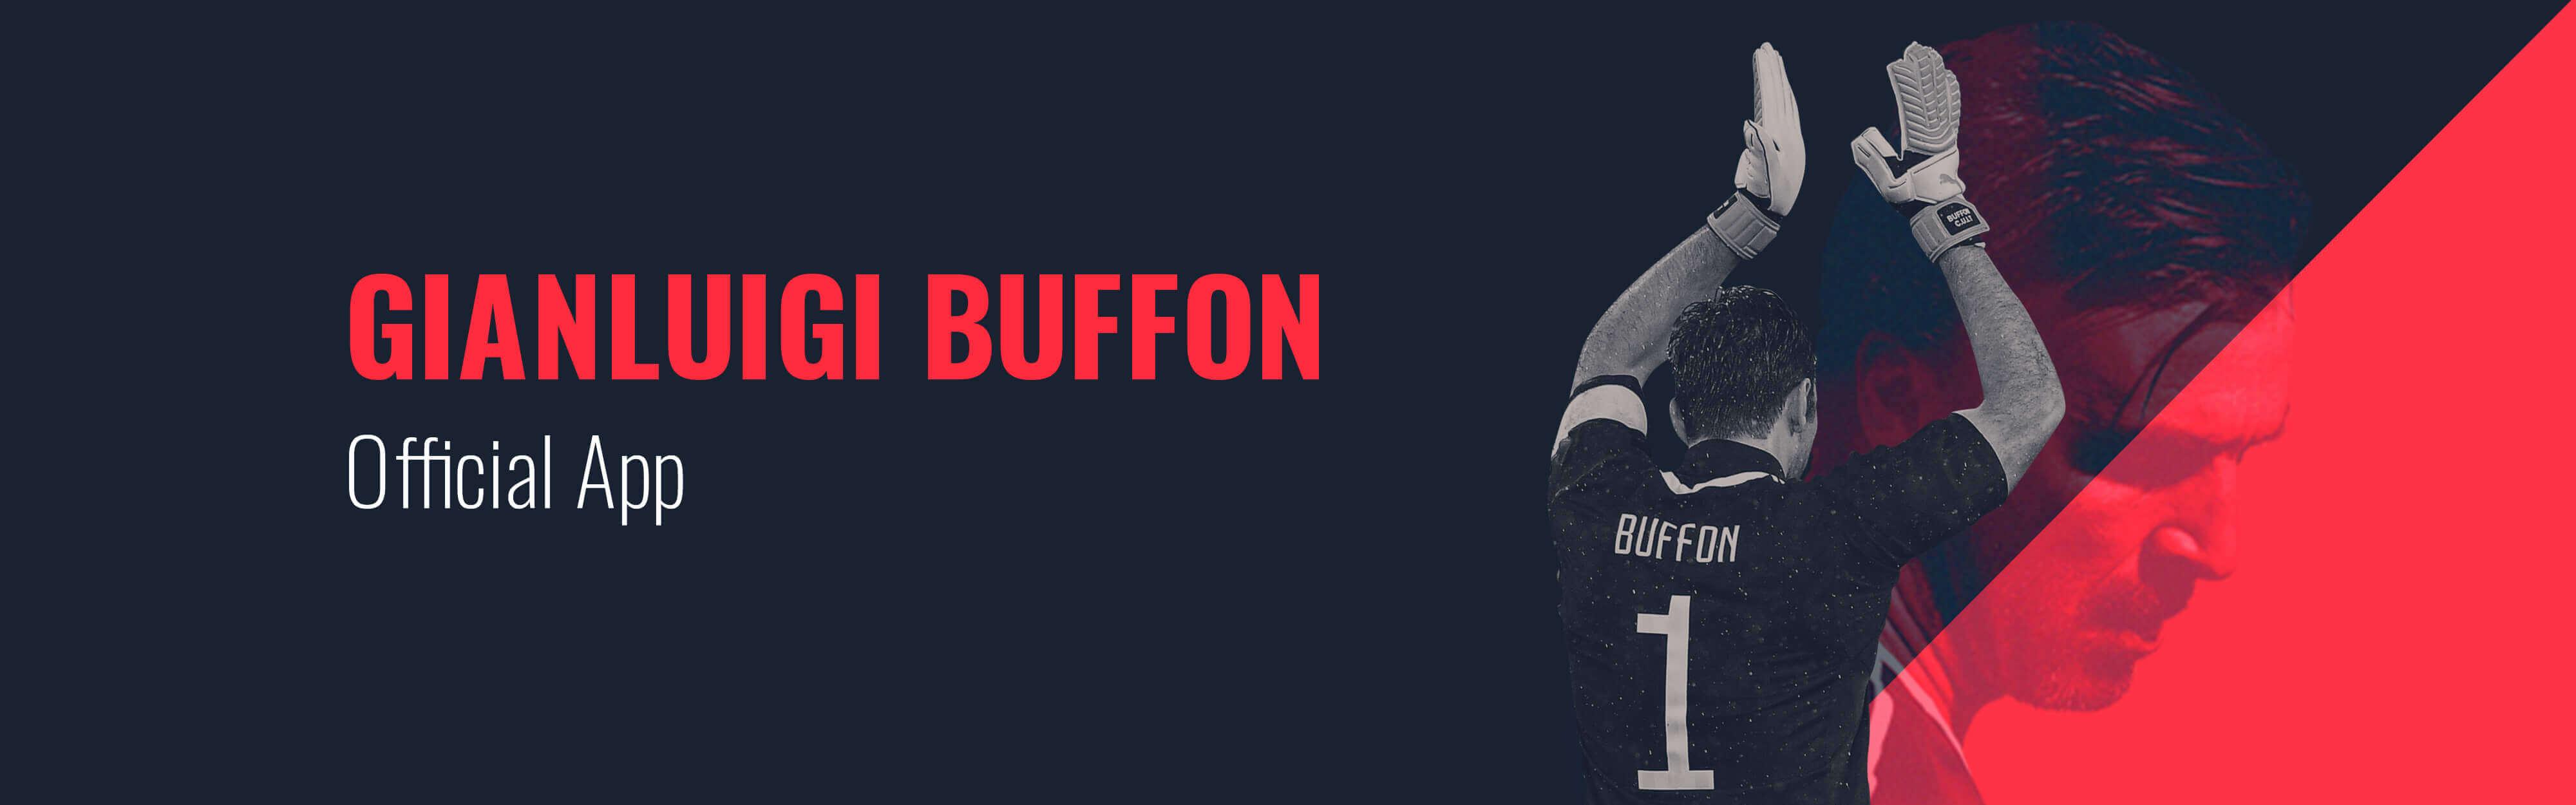 IQUII Sport lancia la nuova Official App di Gianluigi Buffon